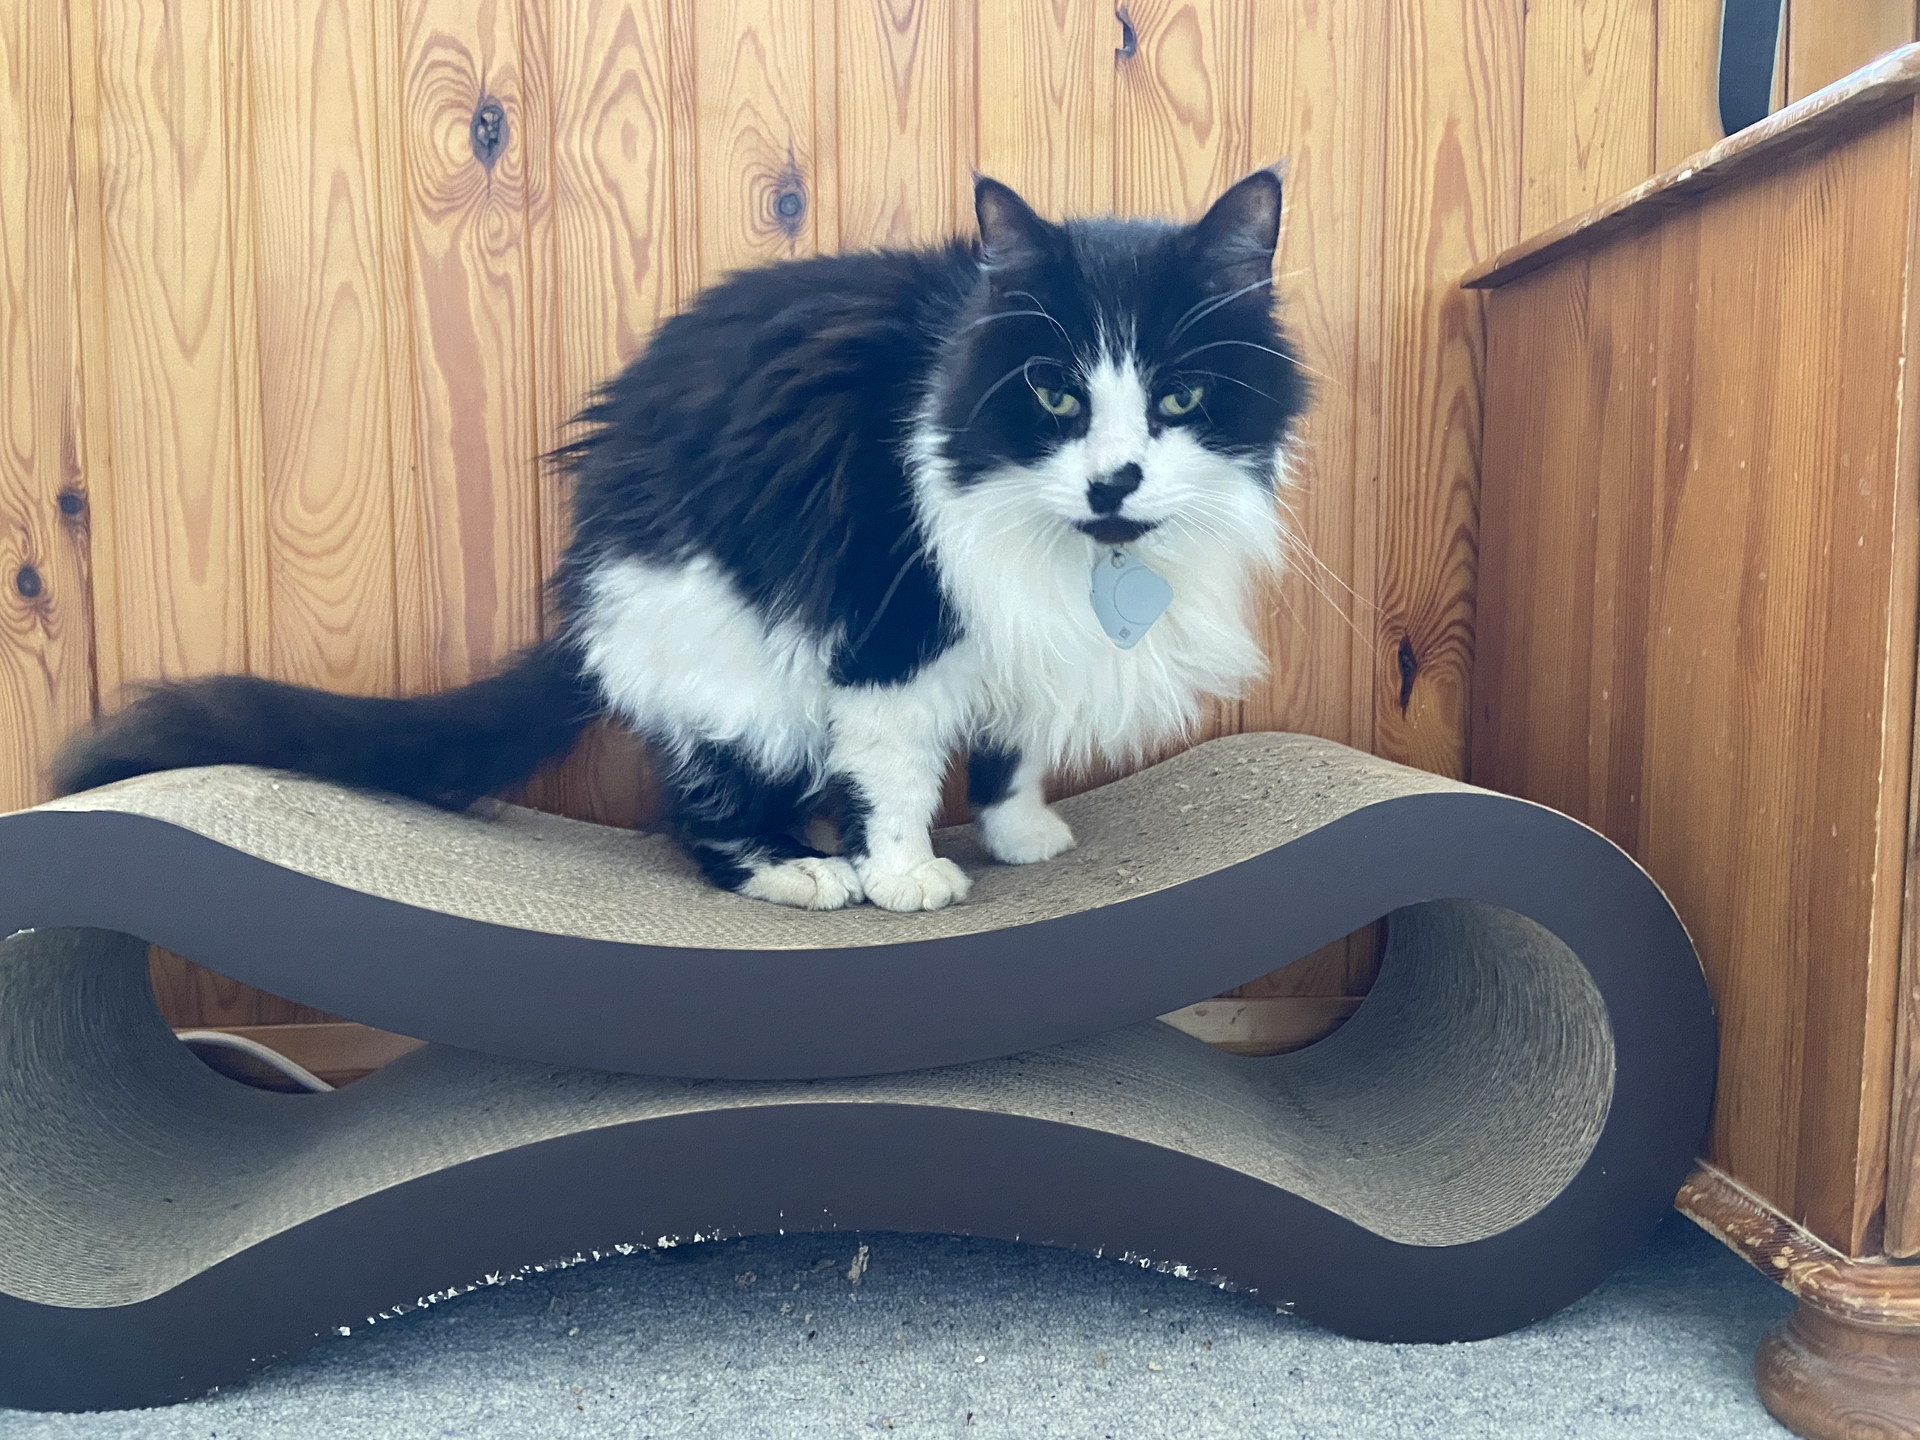 Felis silvestris (domestic cat) 'Mr Mittens' – Durham Home — Tue 31 Mar 2020 11-27-53 BST — 655441836